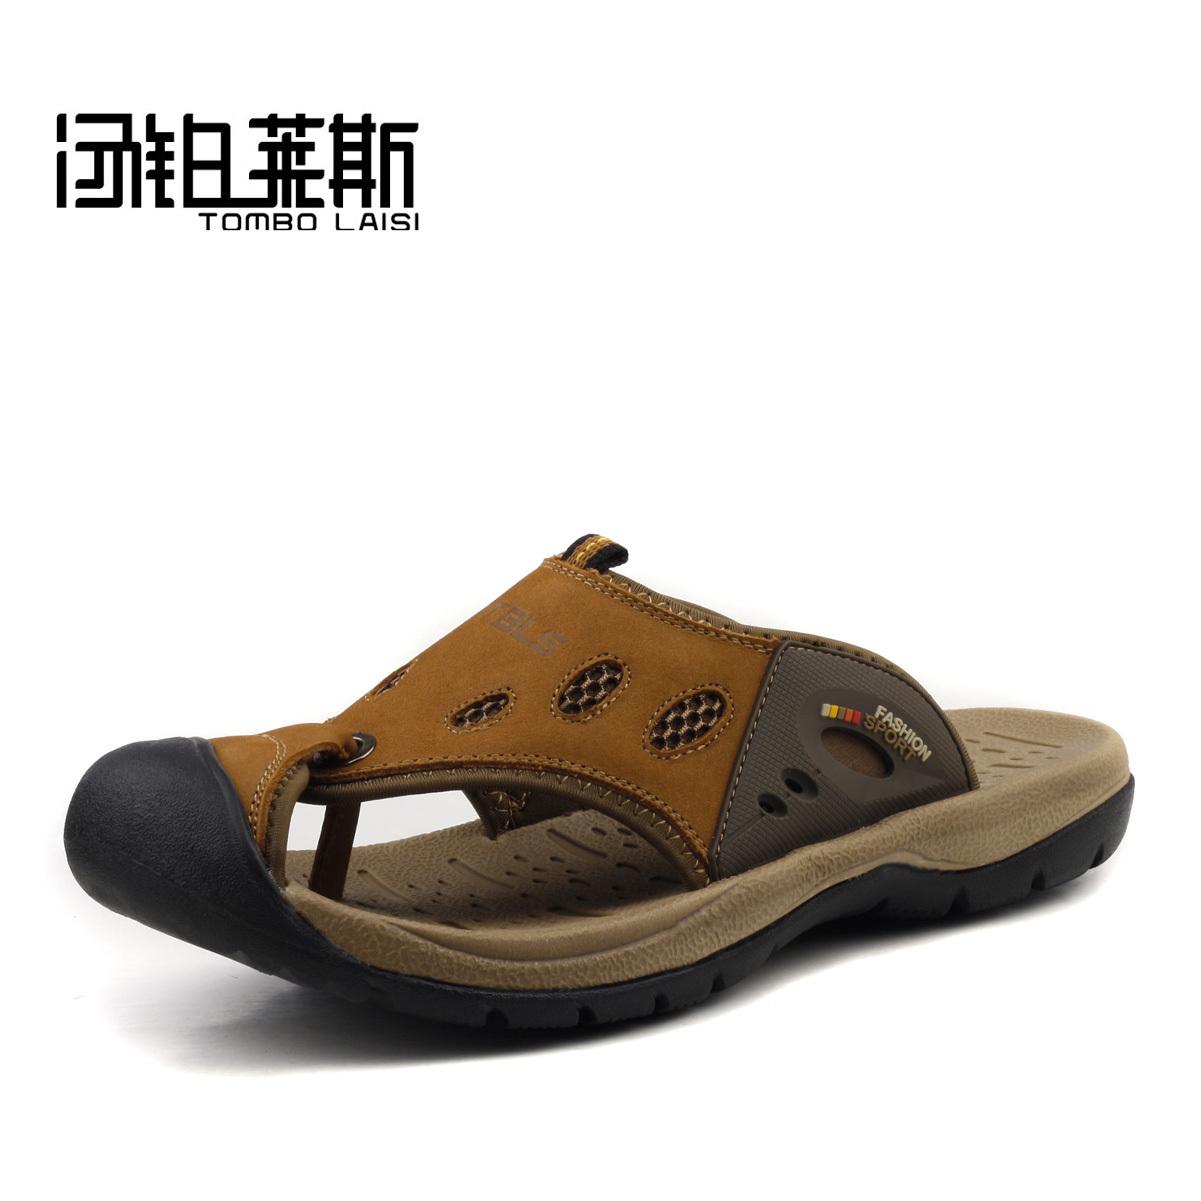 ... Men flip flops sports sandals summer slippers lounged skin drag 2013